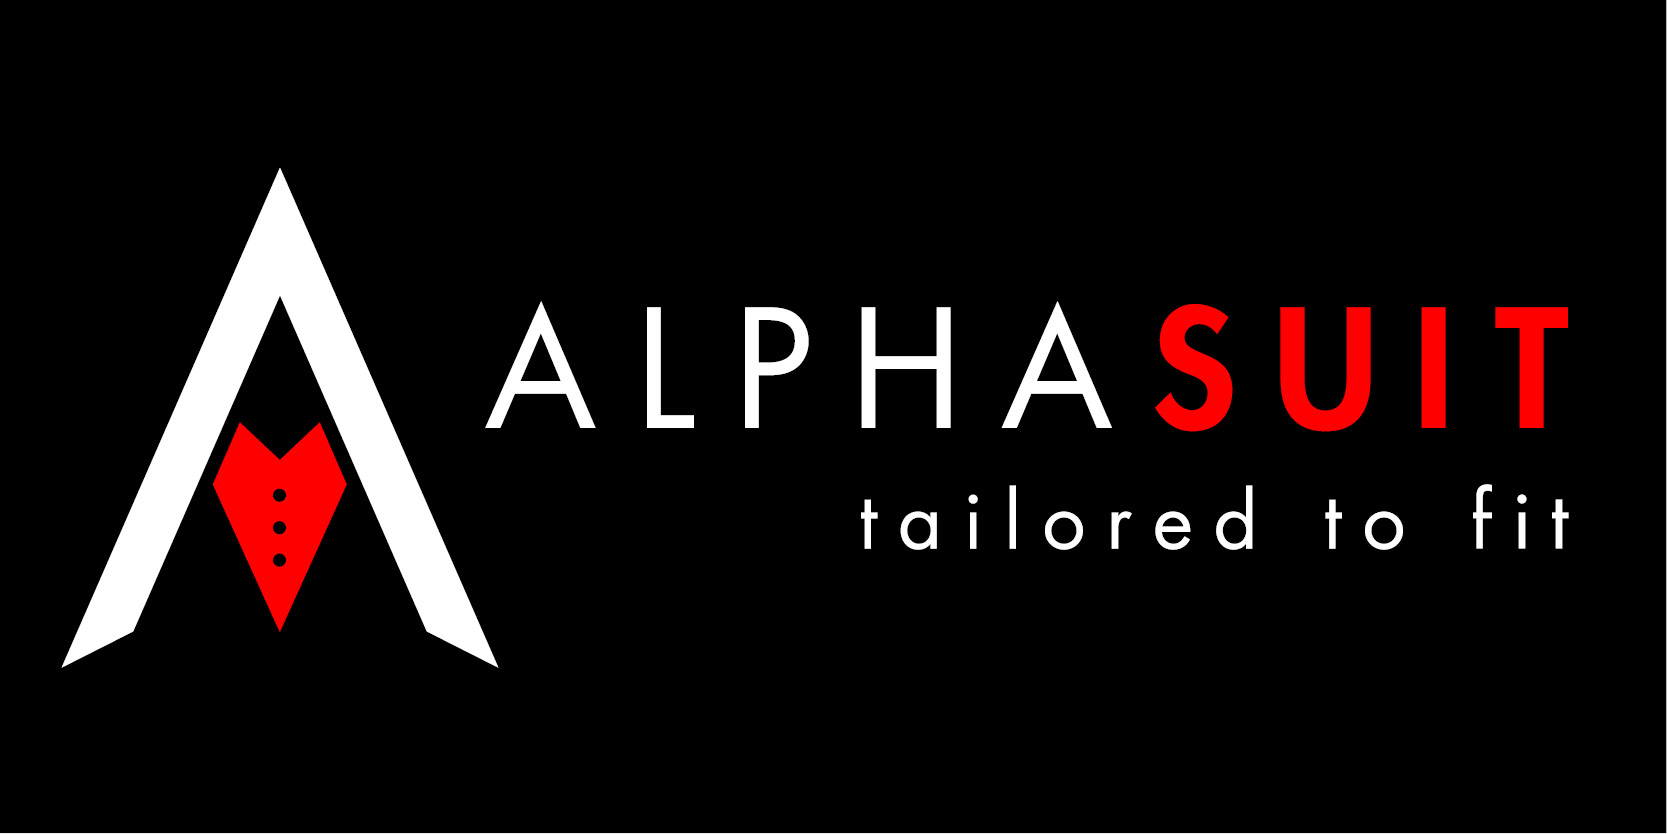 custom made suit logo alphasuit cols oh